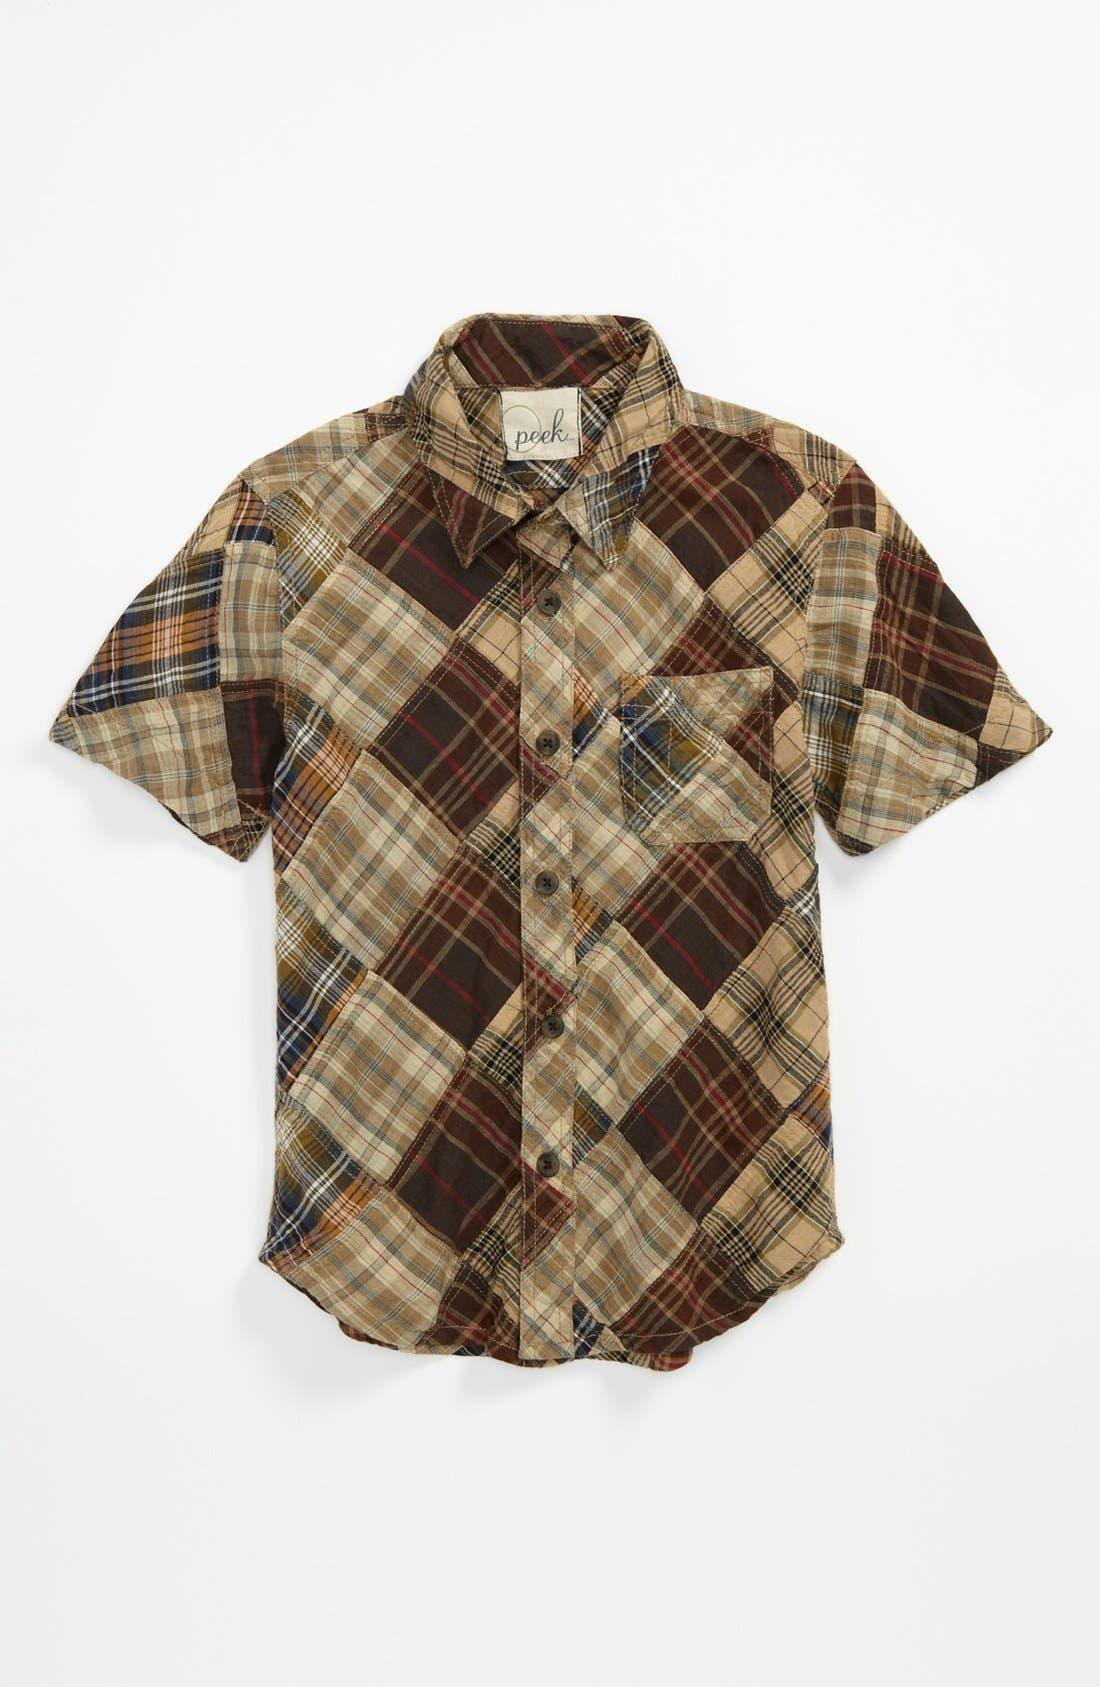 Main Image - Peek 'Grant' Plaid Shirt (Big Boys)